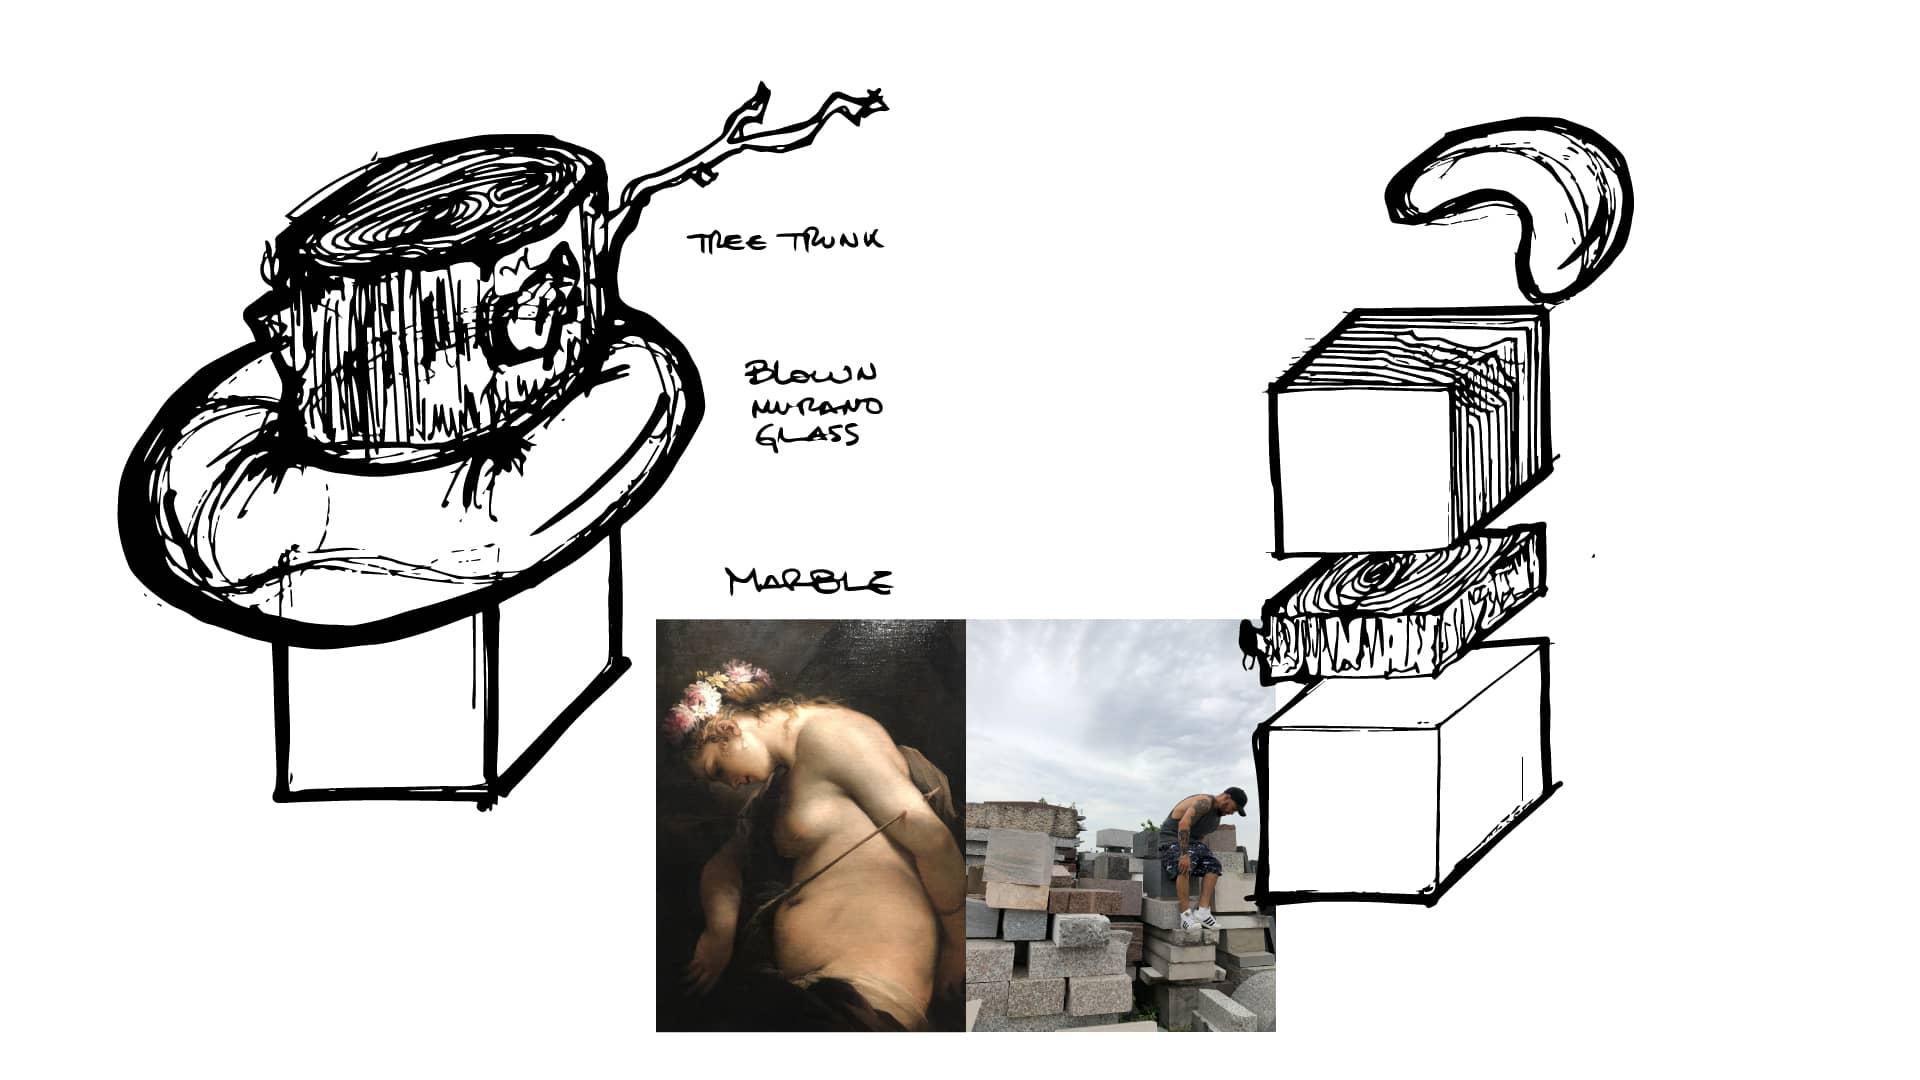 14-CANUC-AARON-NACHTAILER-ART-ARTIST